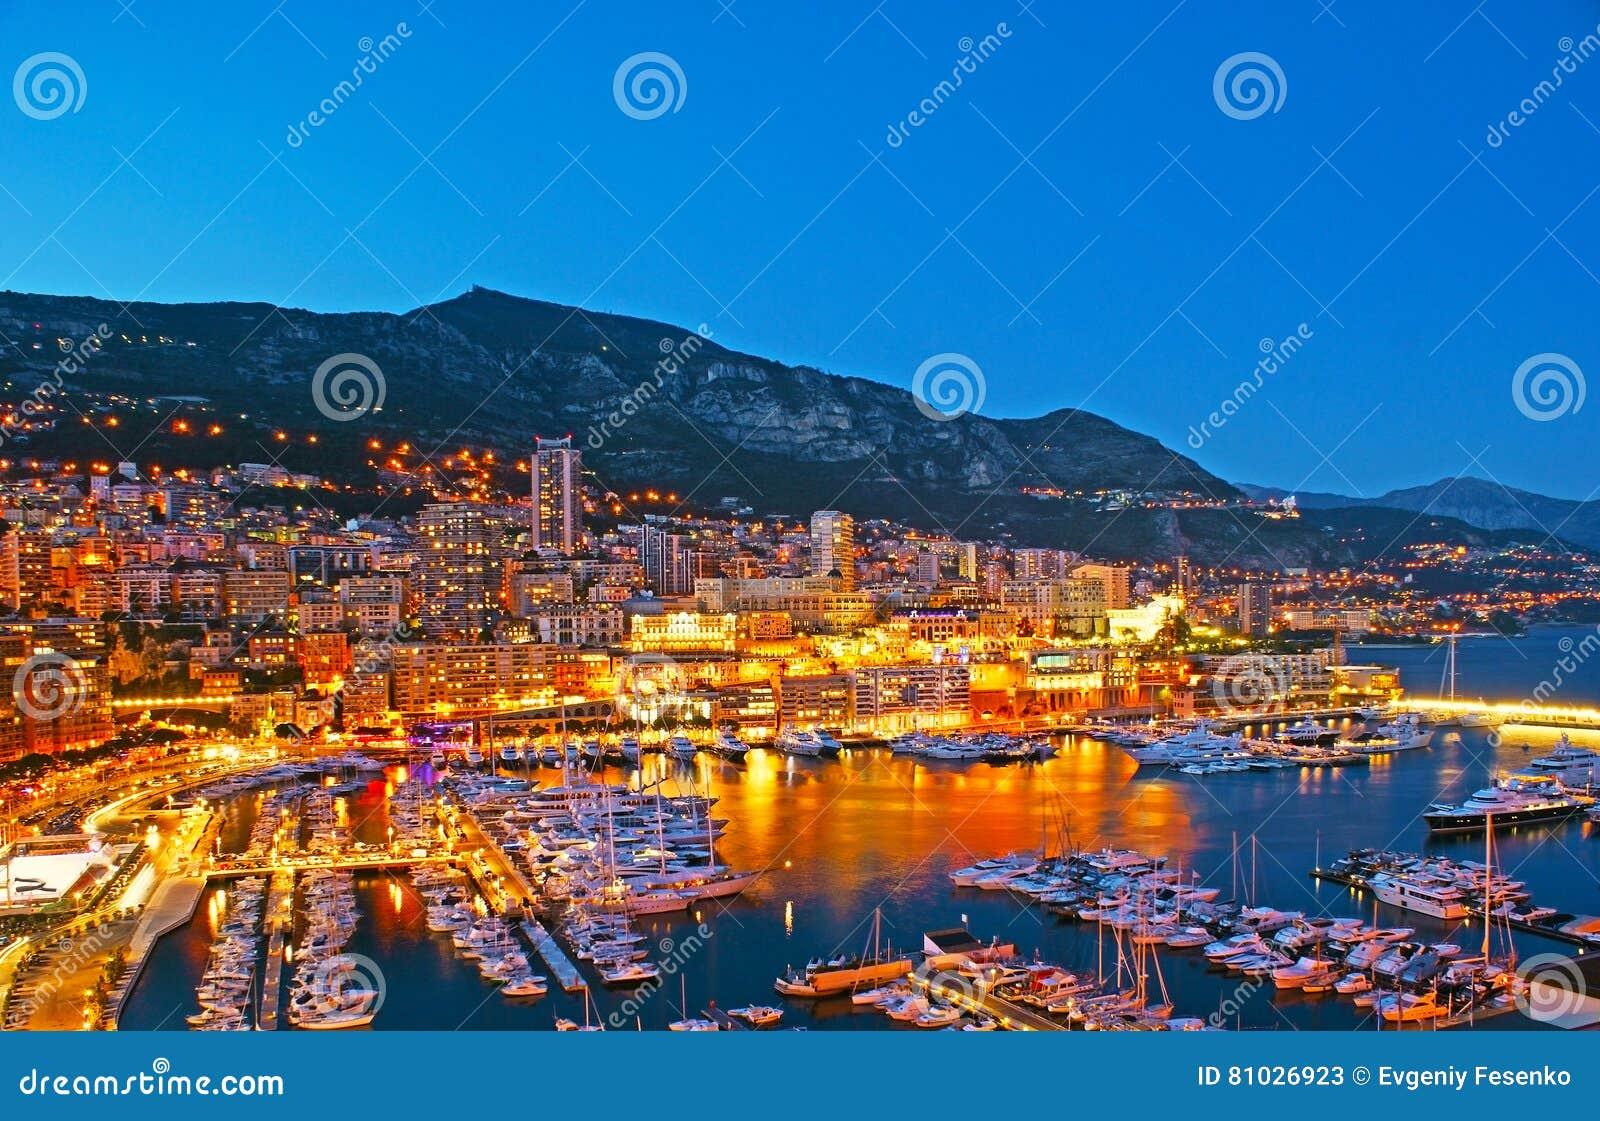 The evening lights of Monaco